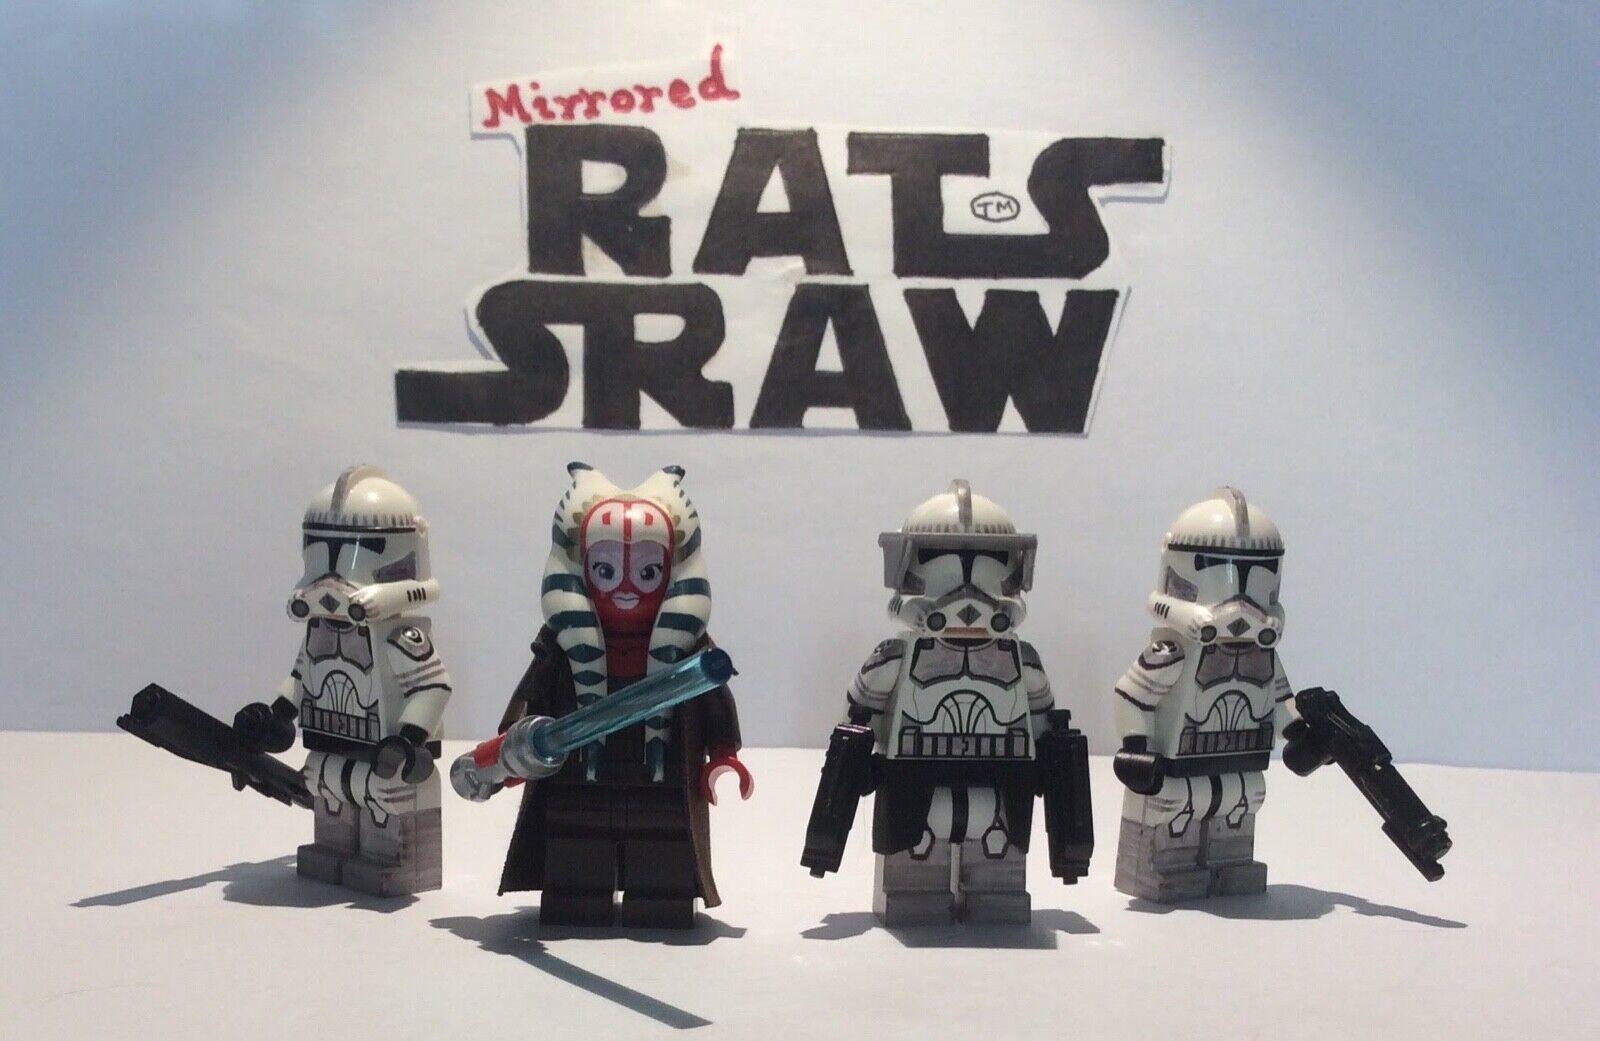 Lego Star Wars minifigures - Clone Custom Troopers - Shaak Ti Kamino set